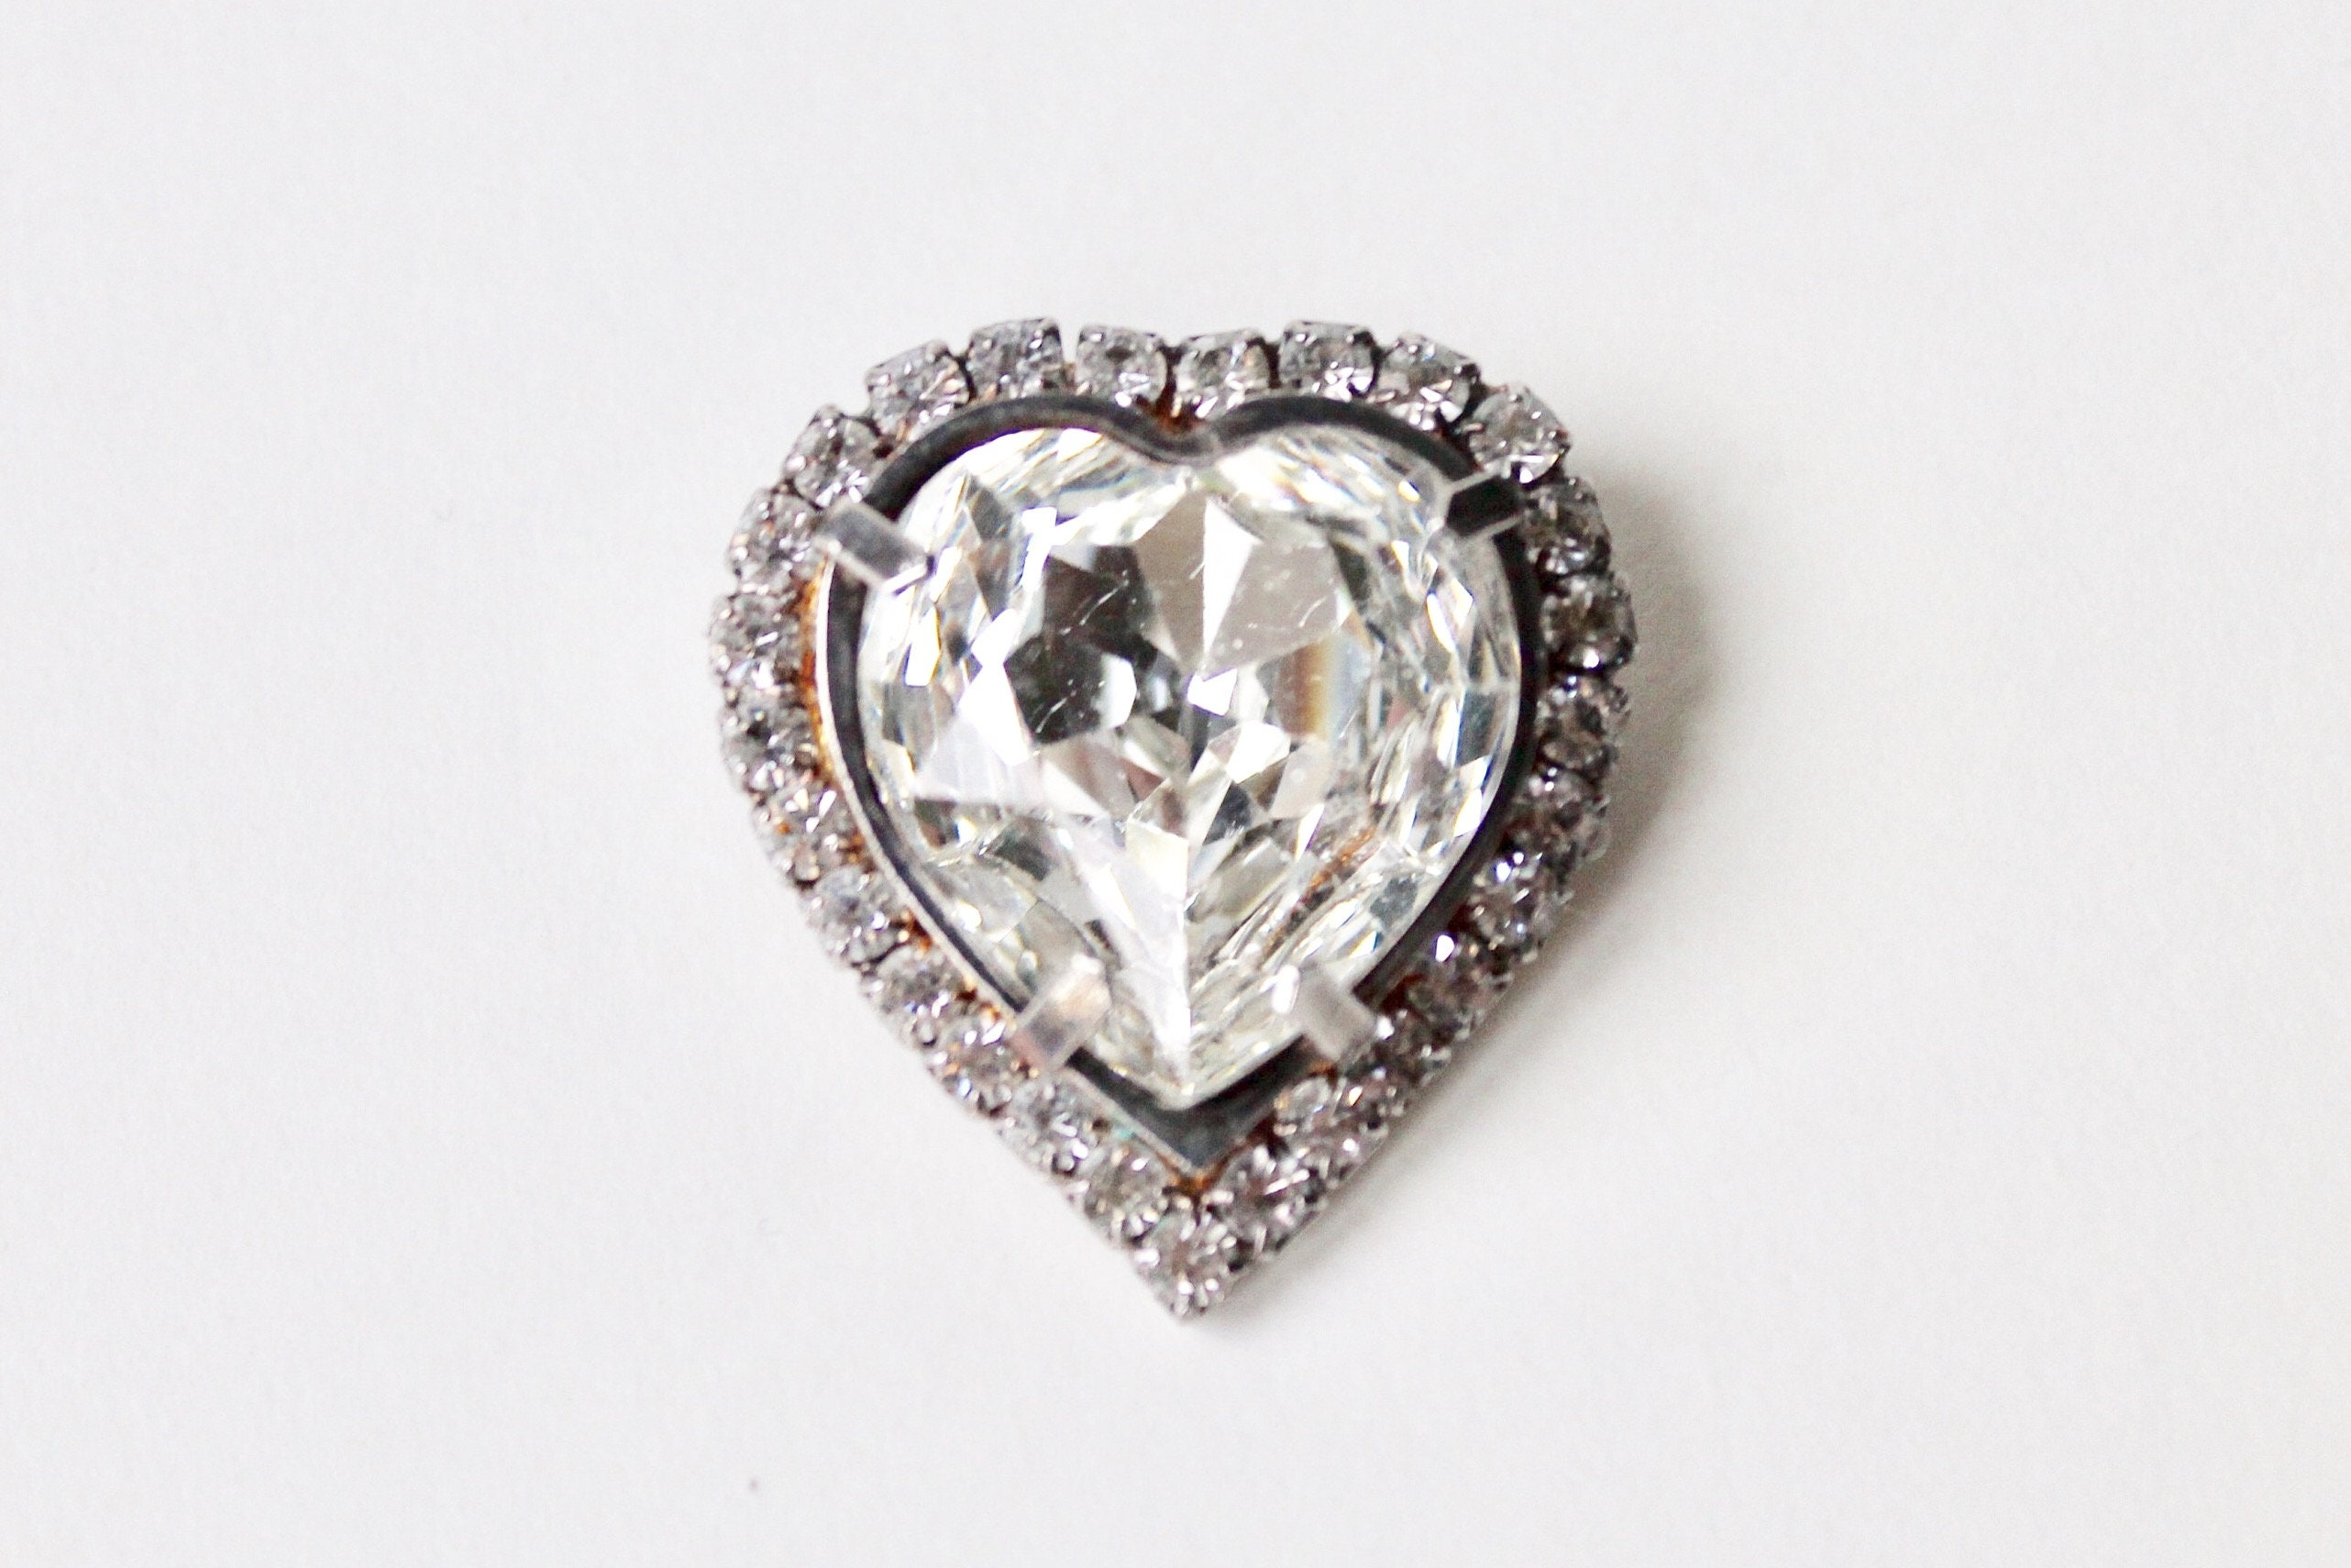 9dfcbab8d89ee Vintage rhinestone heart brooch. Crystal clear heart brooch.   Etsy